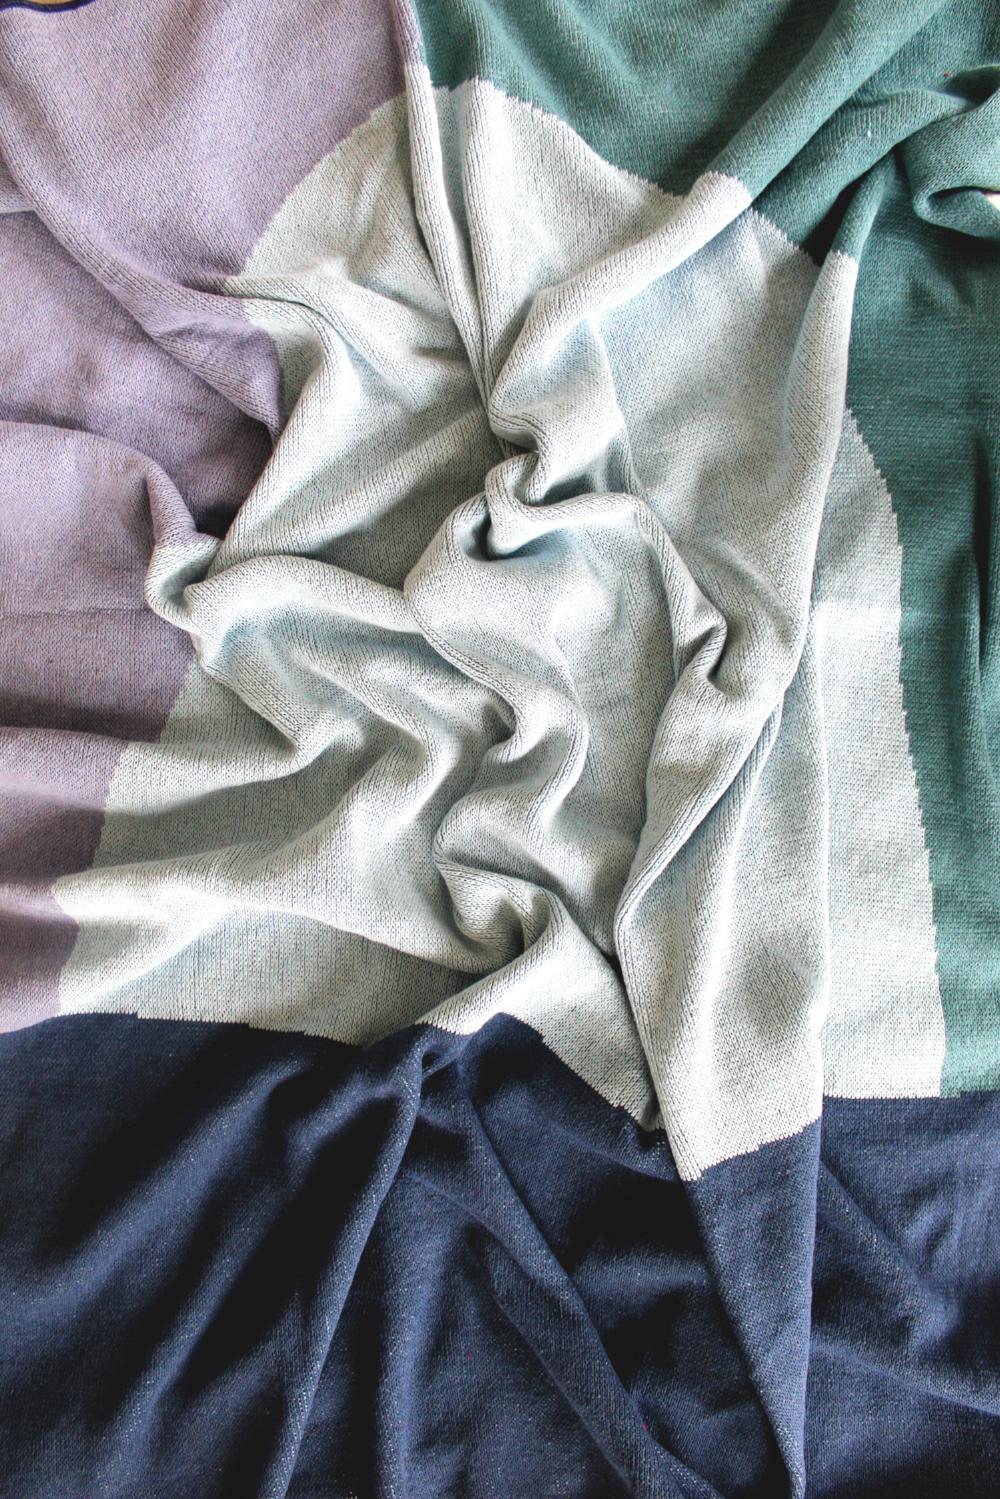 Ocean Sunrise Blue Blanket by Calhoun & Co. - Home decor Made in USA